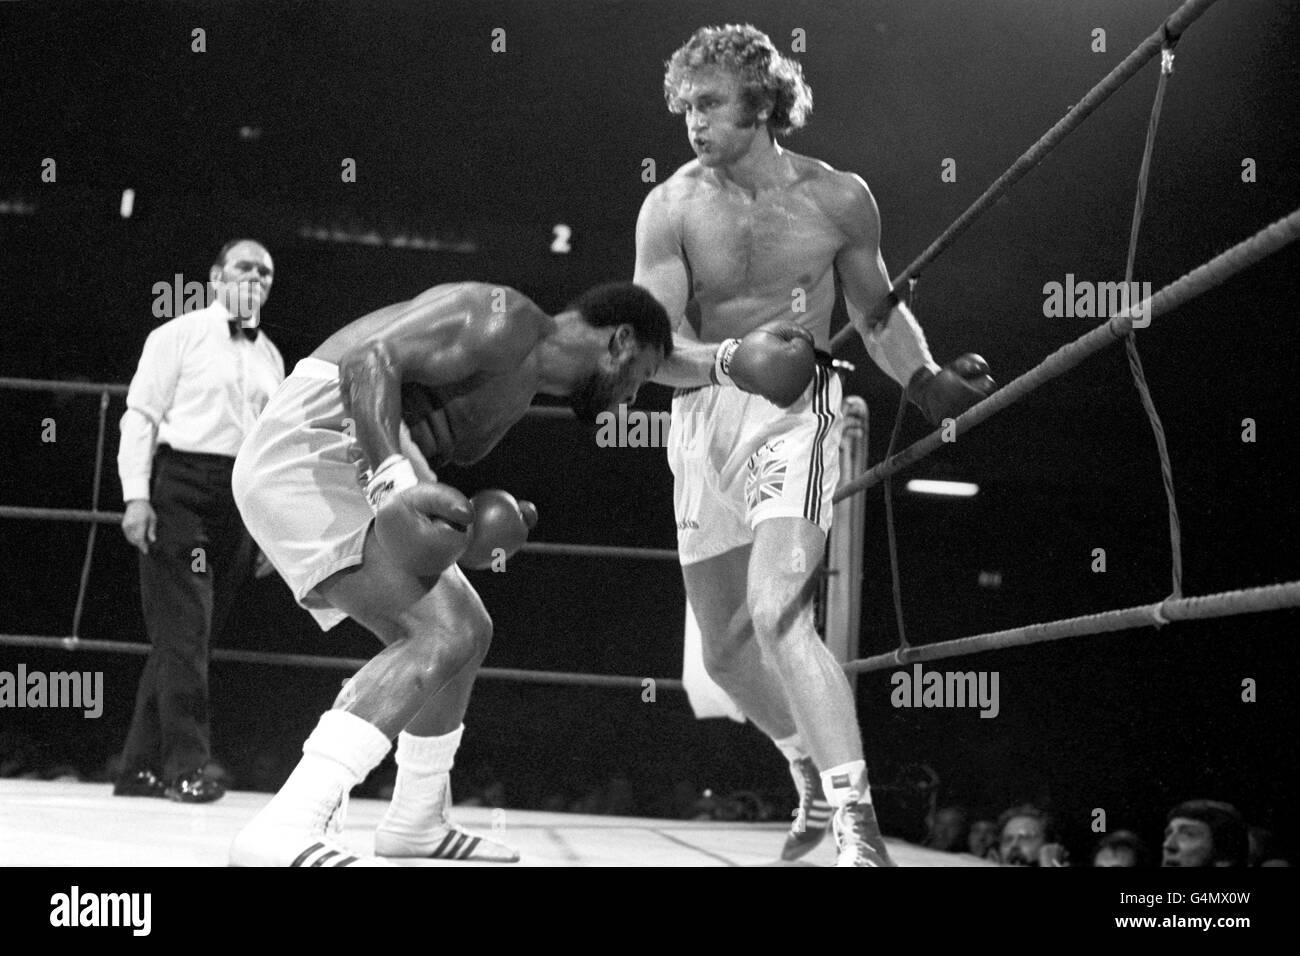 Boxing - Heavyweight - Joe Bugner v Joe Frazier - Earls Court Arena, London Stock Photo